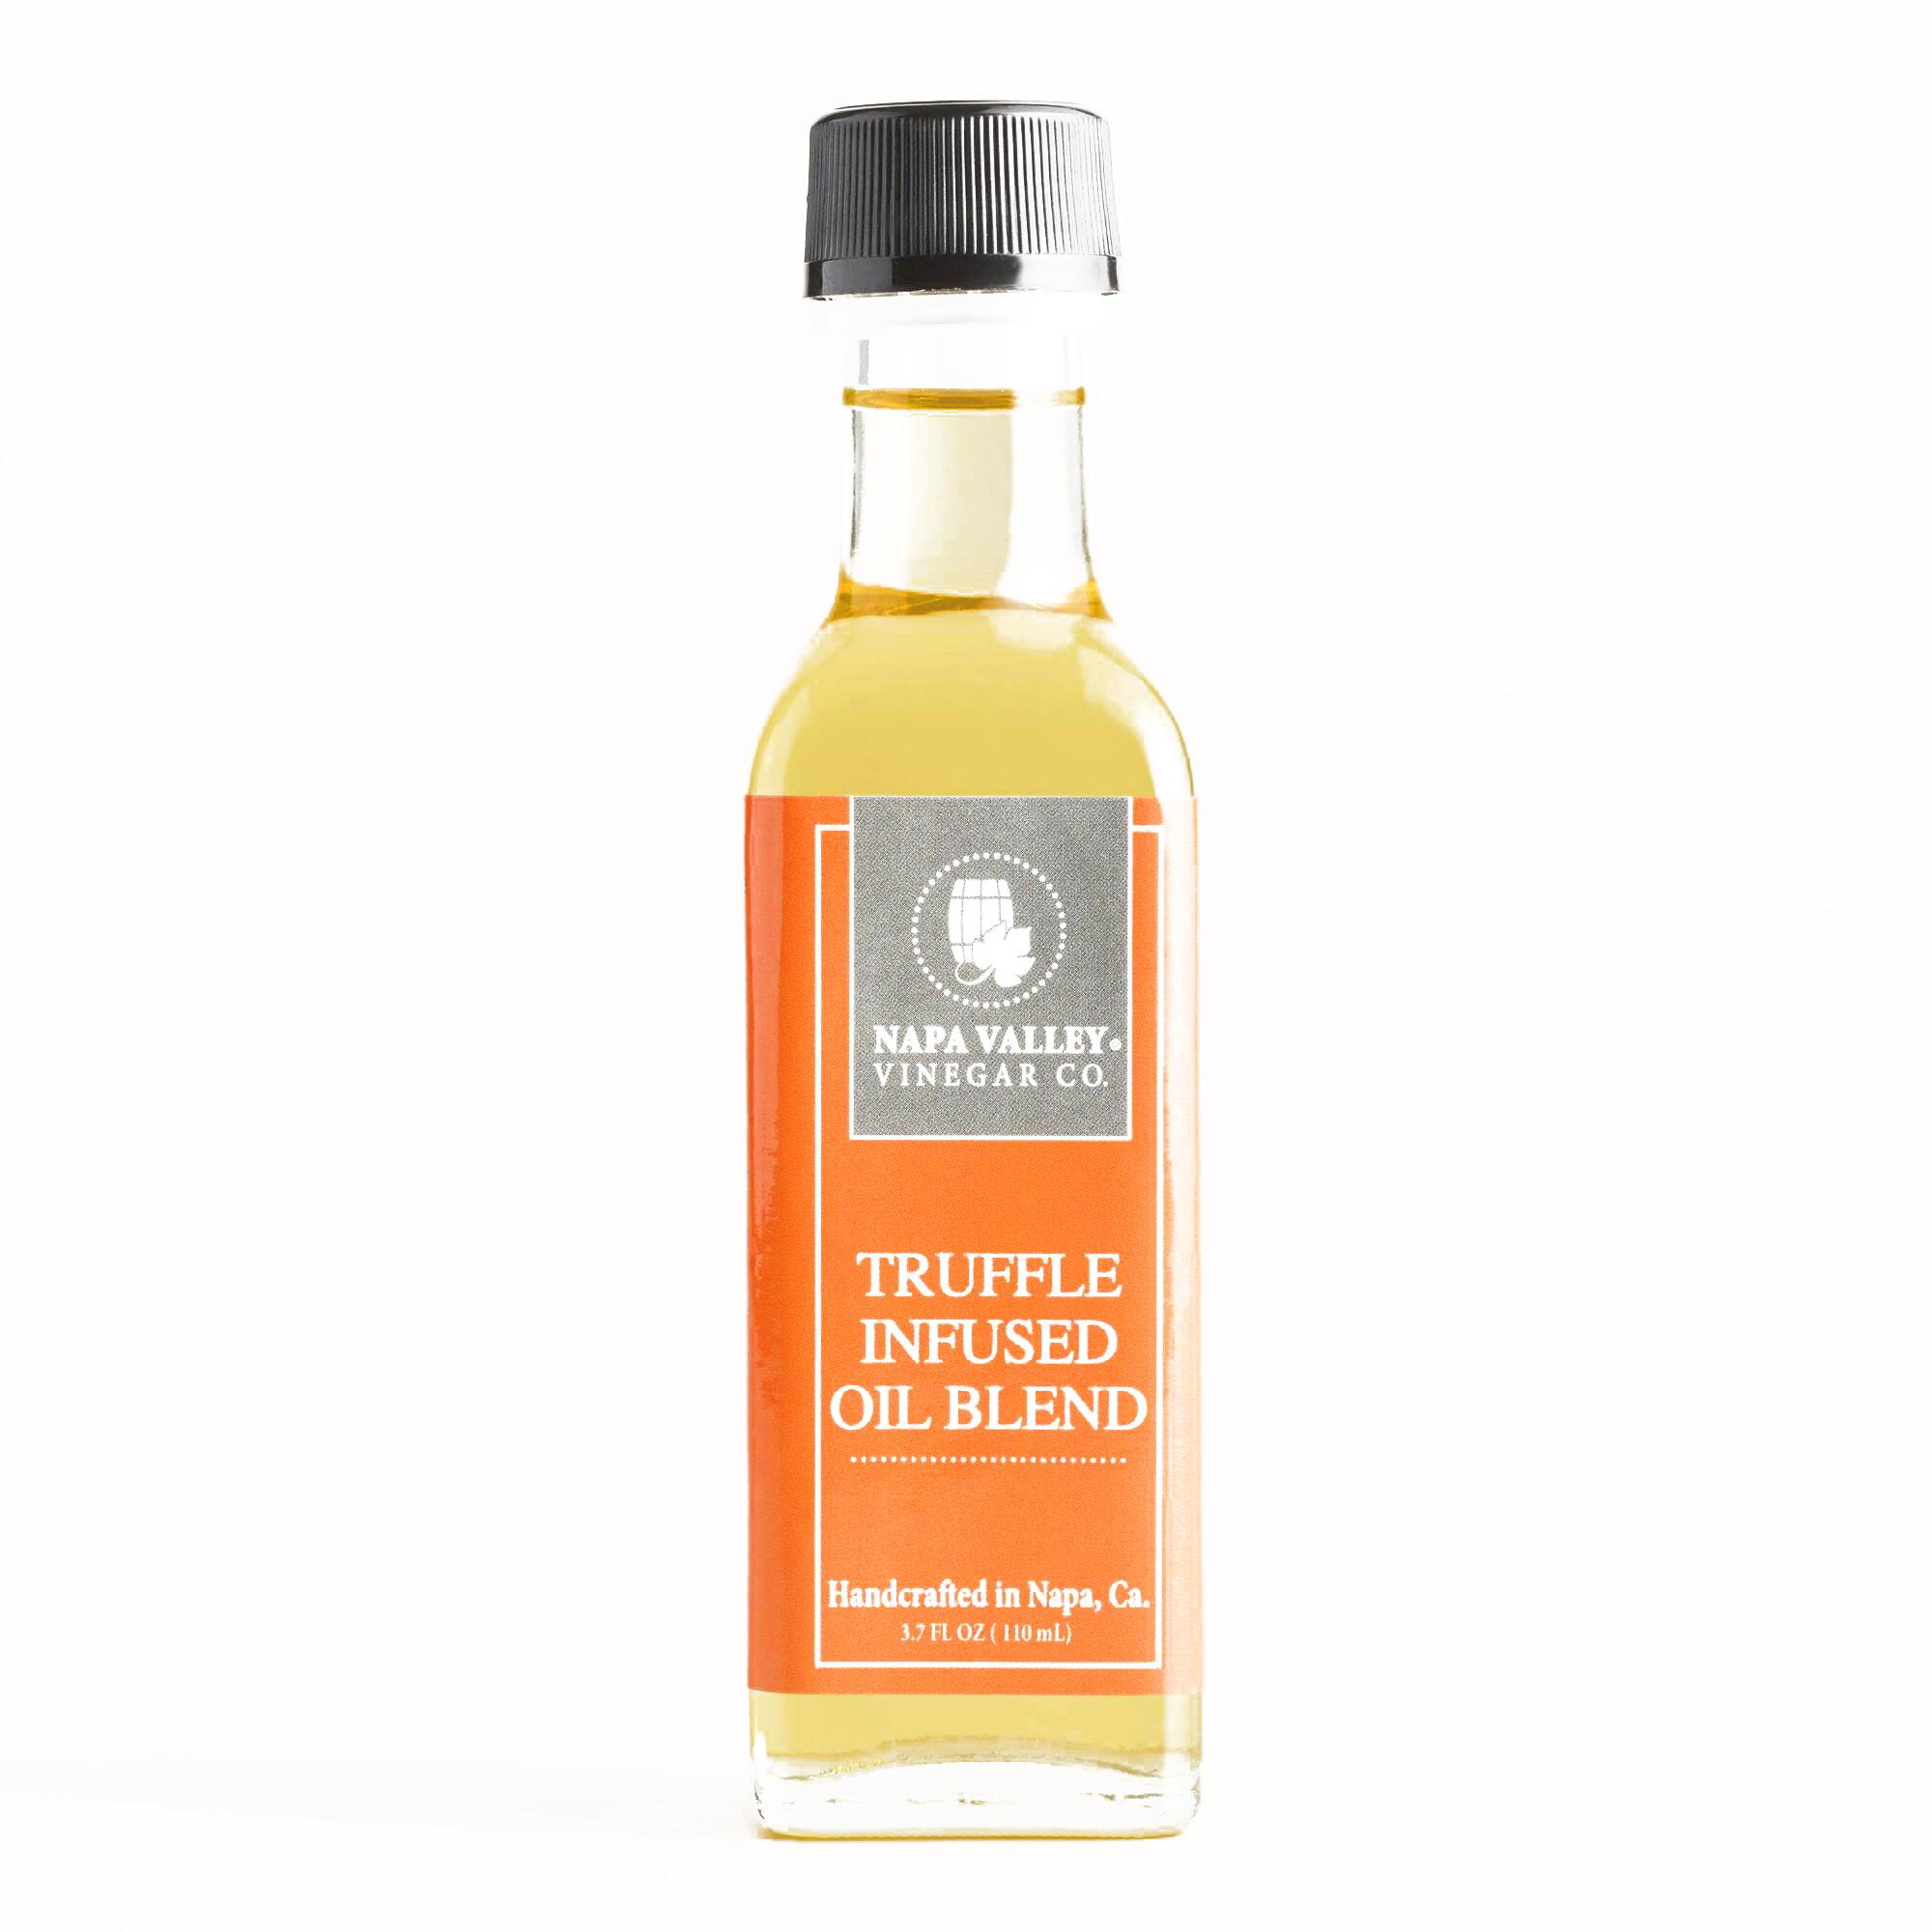 Napa Valley Truffle Oil Blend \t3.7 oz each (1 Item Per Order, not per case) by